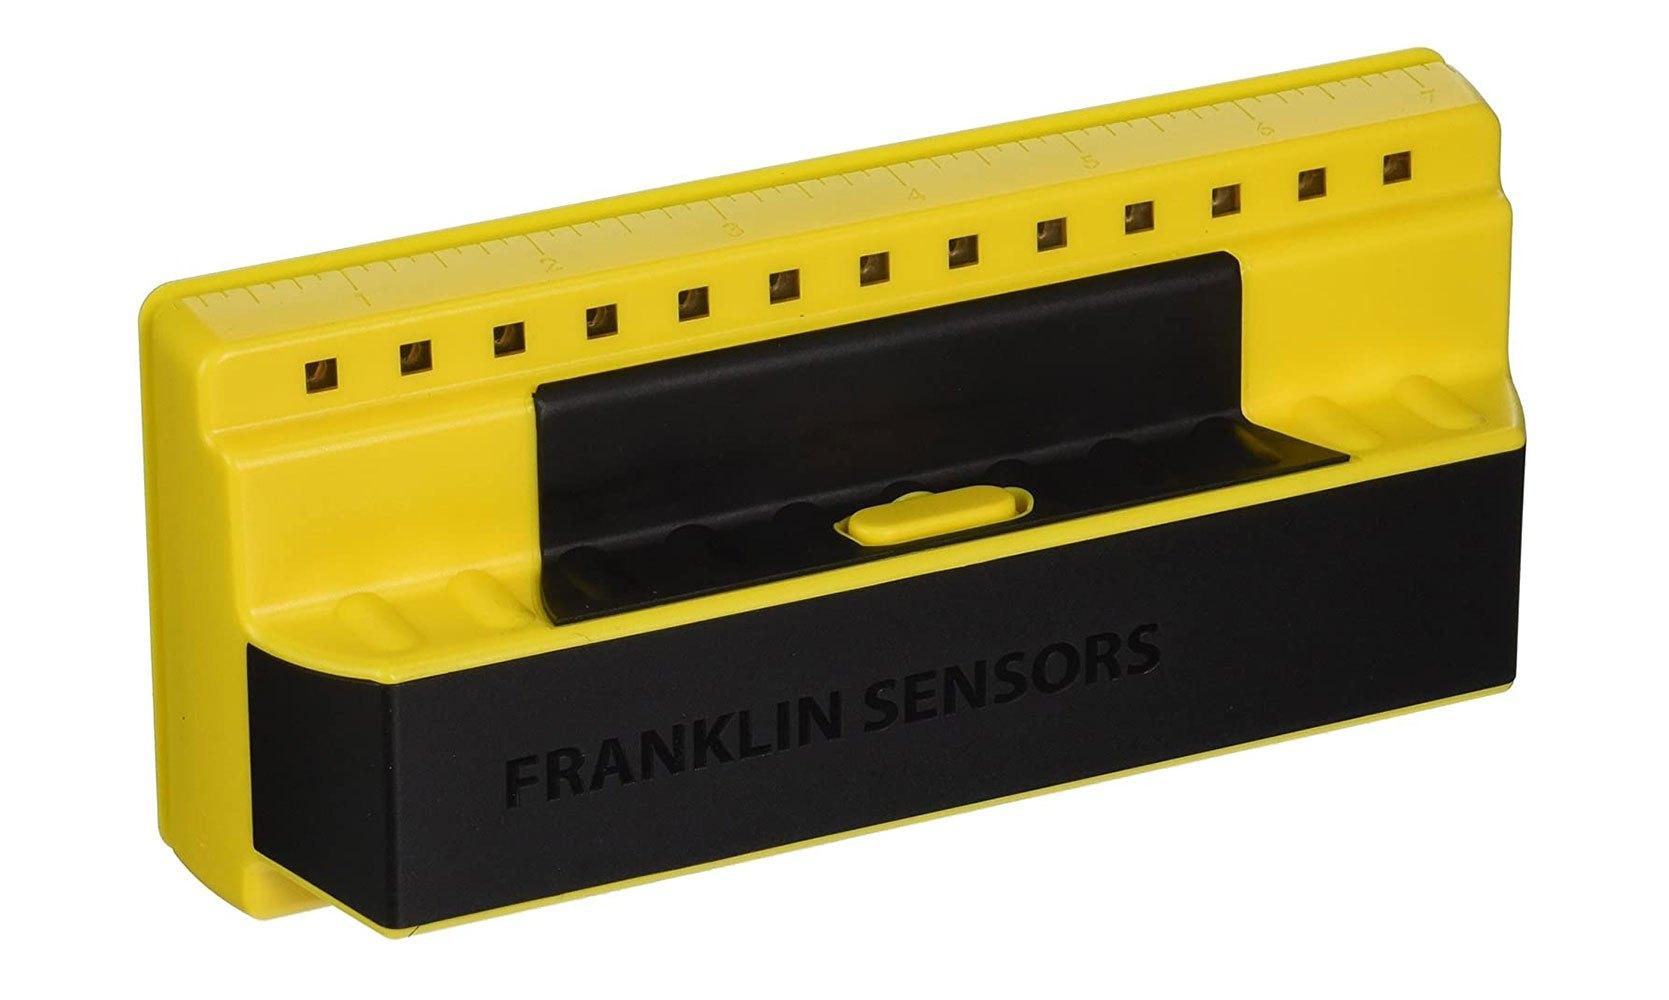 FranklinStudSensor